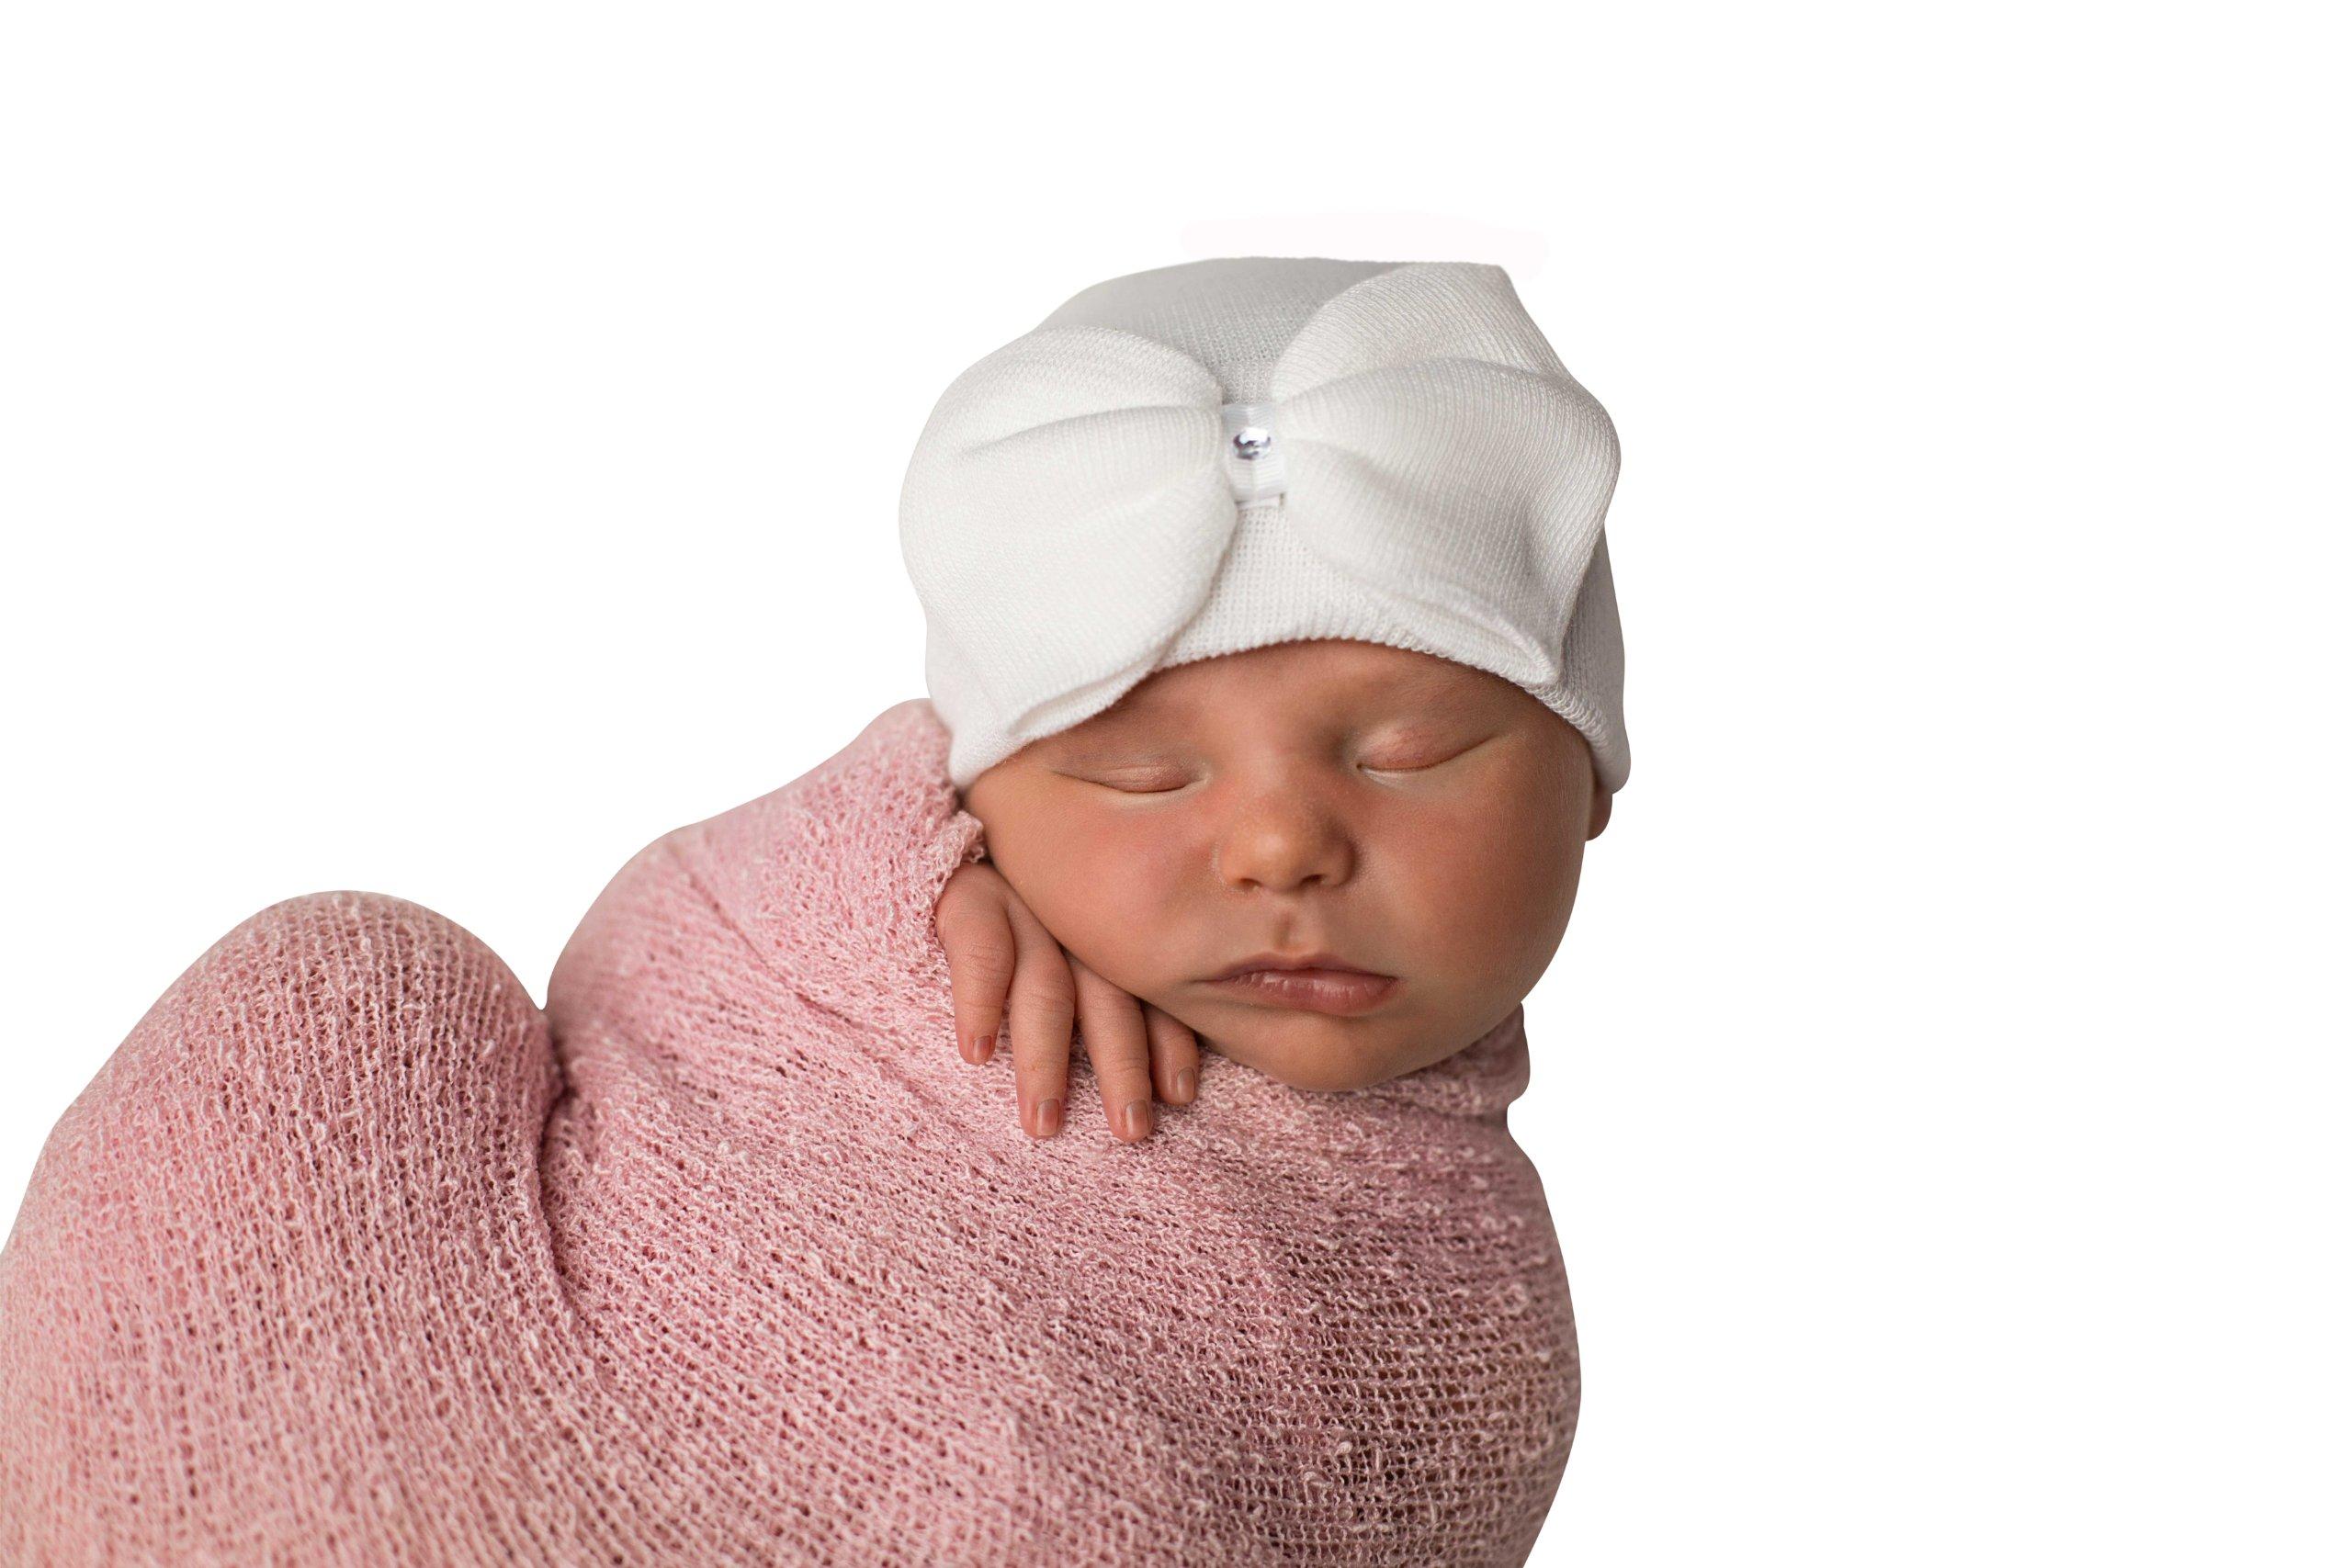 Melondipity's Big White Bow with Gem Baby Girl Newborn Hospital Hat